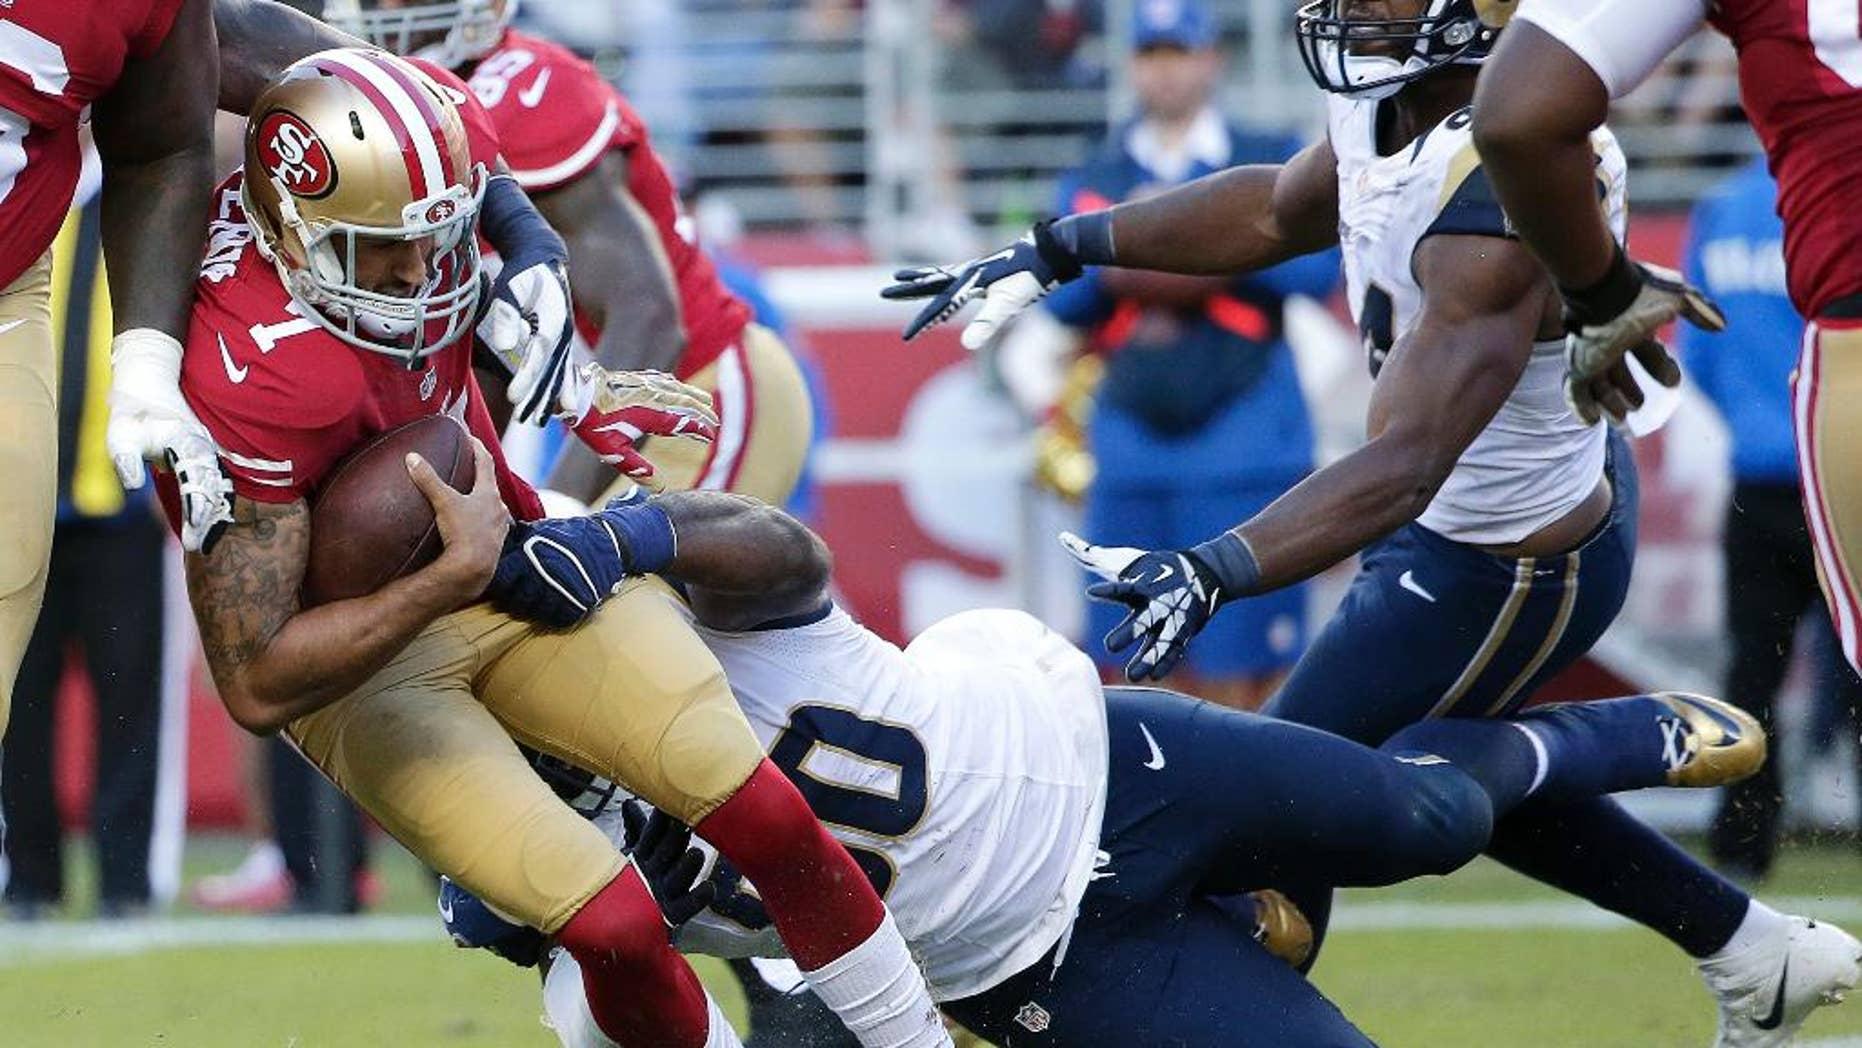 San Francisco 49ers quarterback Colin Kaepernick (7) is sacked by St. Louis Rams defensive tackle Michael Brockers during the fourth quarter of an NFL football game in Santa Clara, Calif., Sunday, Nov. 2, 2014. (AP Photo/Marcio Jose Sanchez)